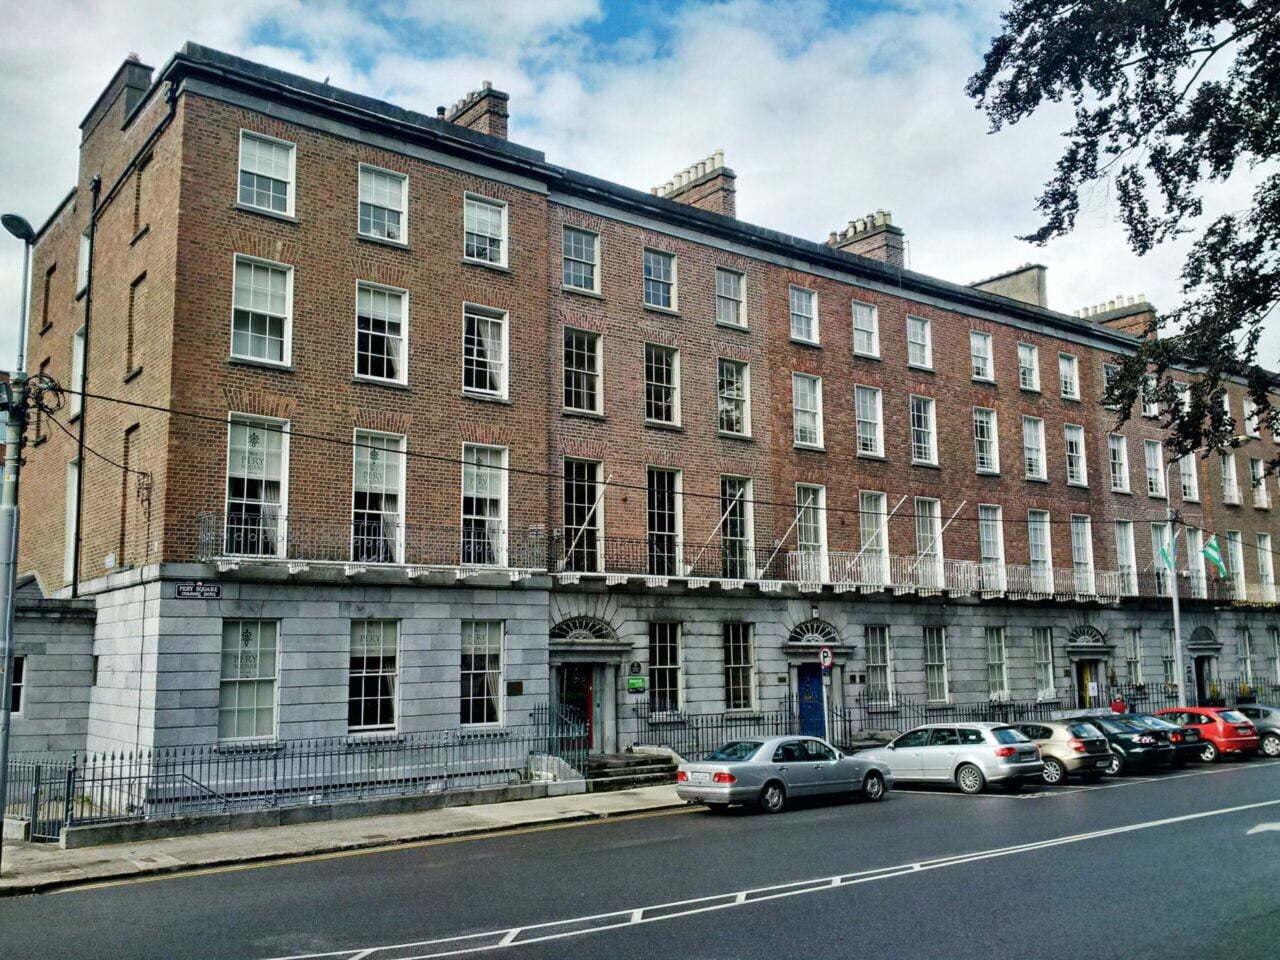 Cidades para estudar na Irlanda, lugares para estudar na irlanda,